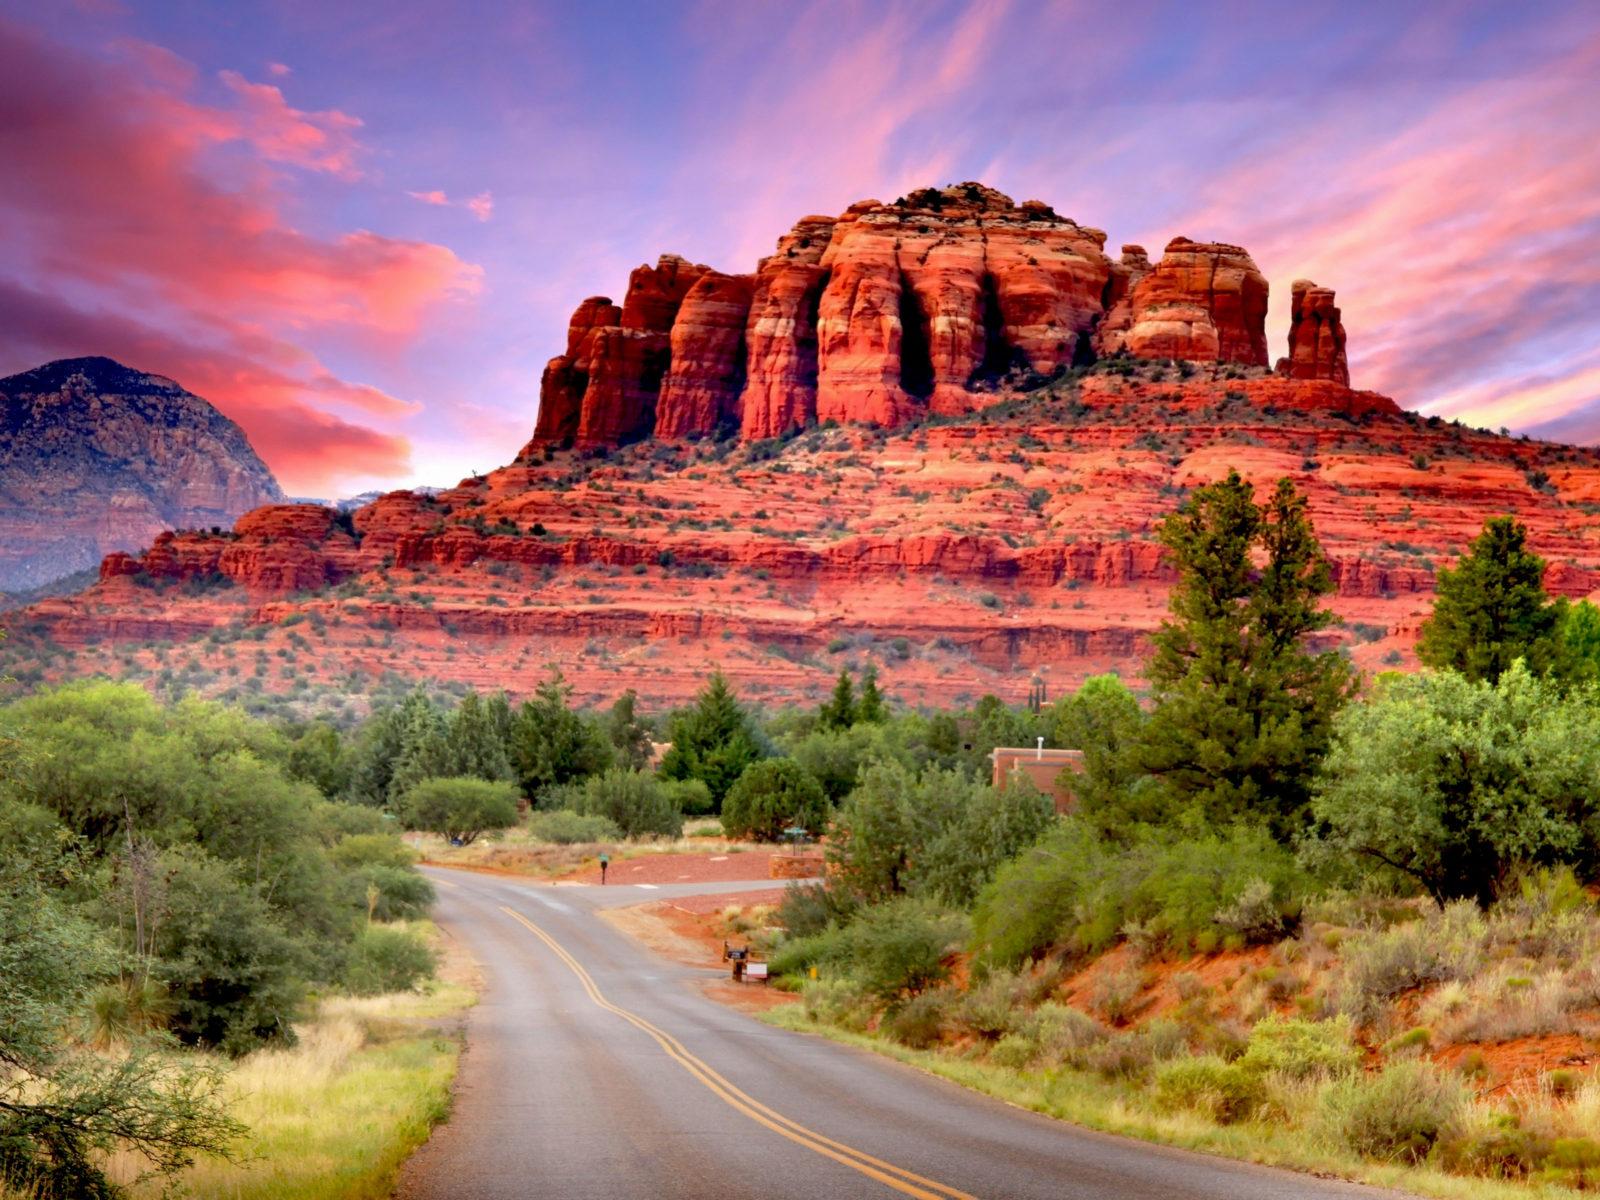 New Zealand Wallpaper Iphone X Fly Drive Scenario Of Sedona Arizona United States